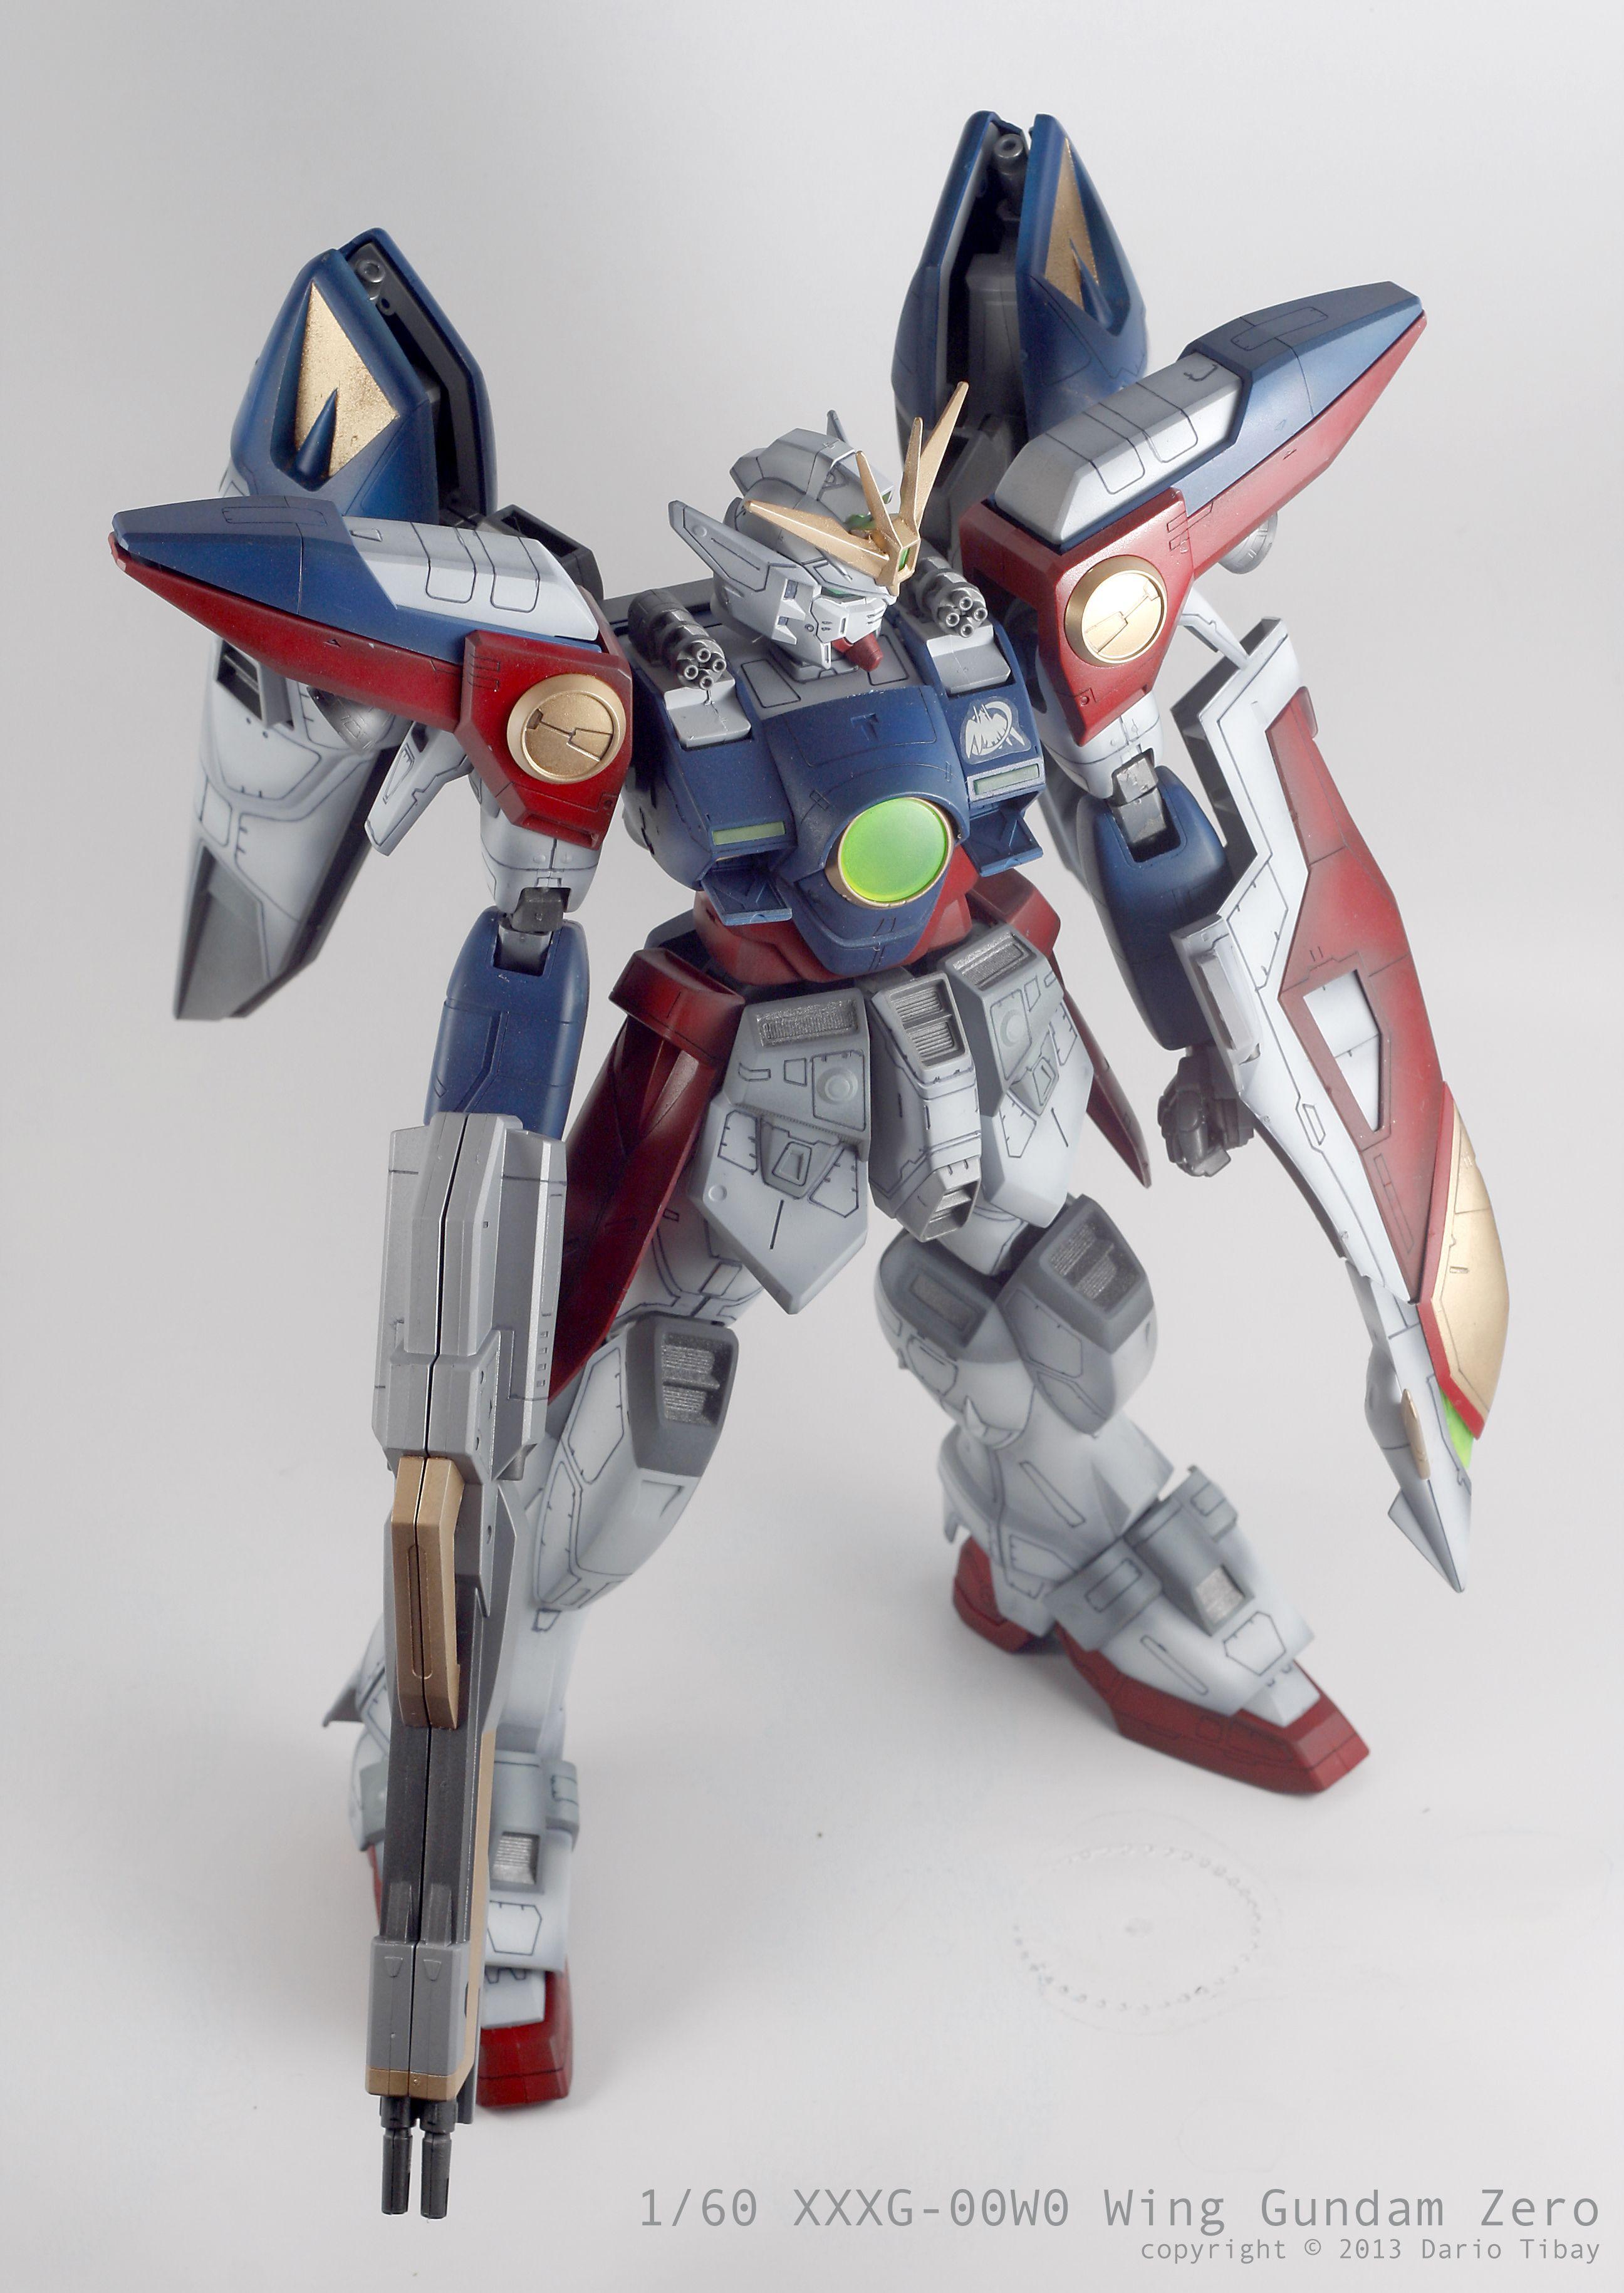 1/60 Gundam Wing Zero by Dario TIbay Gundam wing, Anime